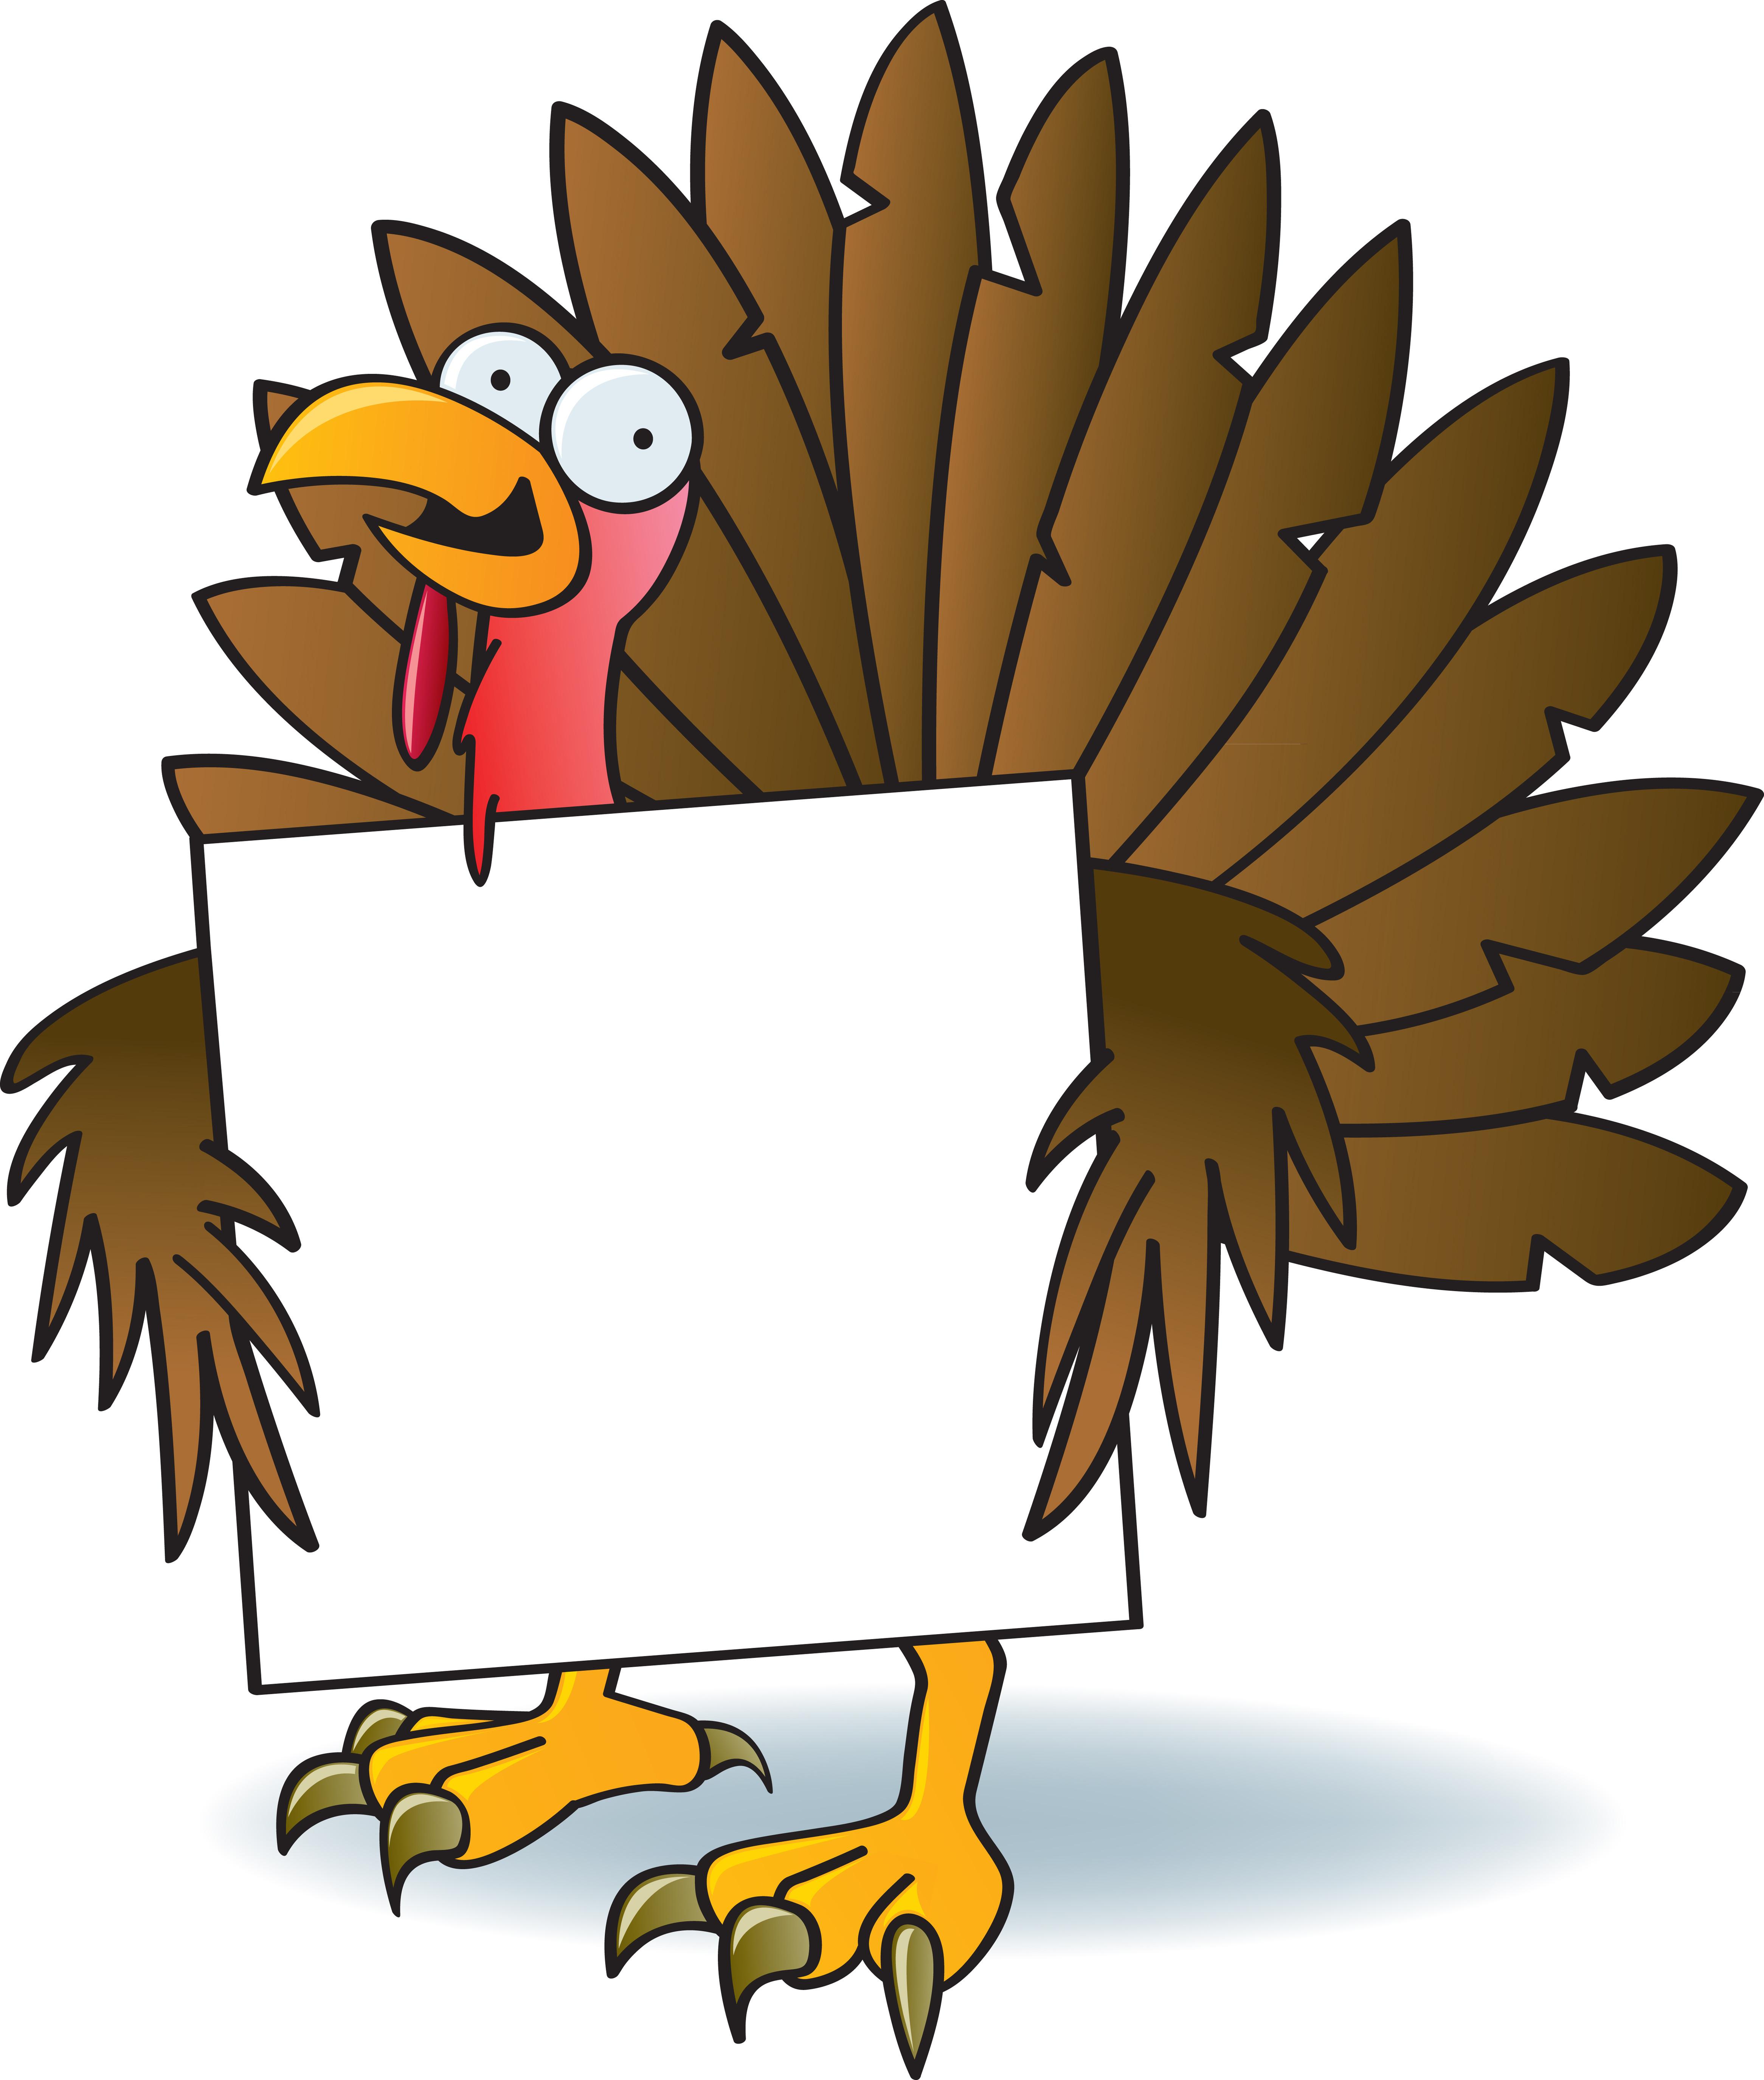 Turkey Thanksgiving Cartoon  Illustration Vector by Jamie Slavy at Coroflot